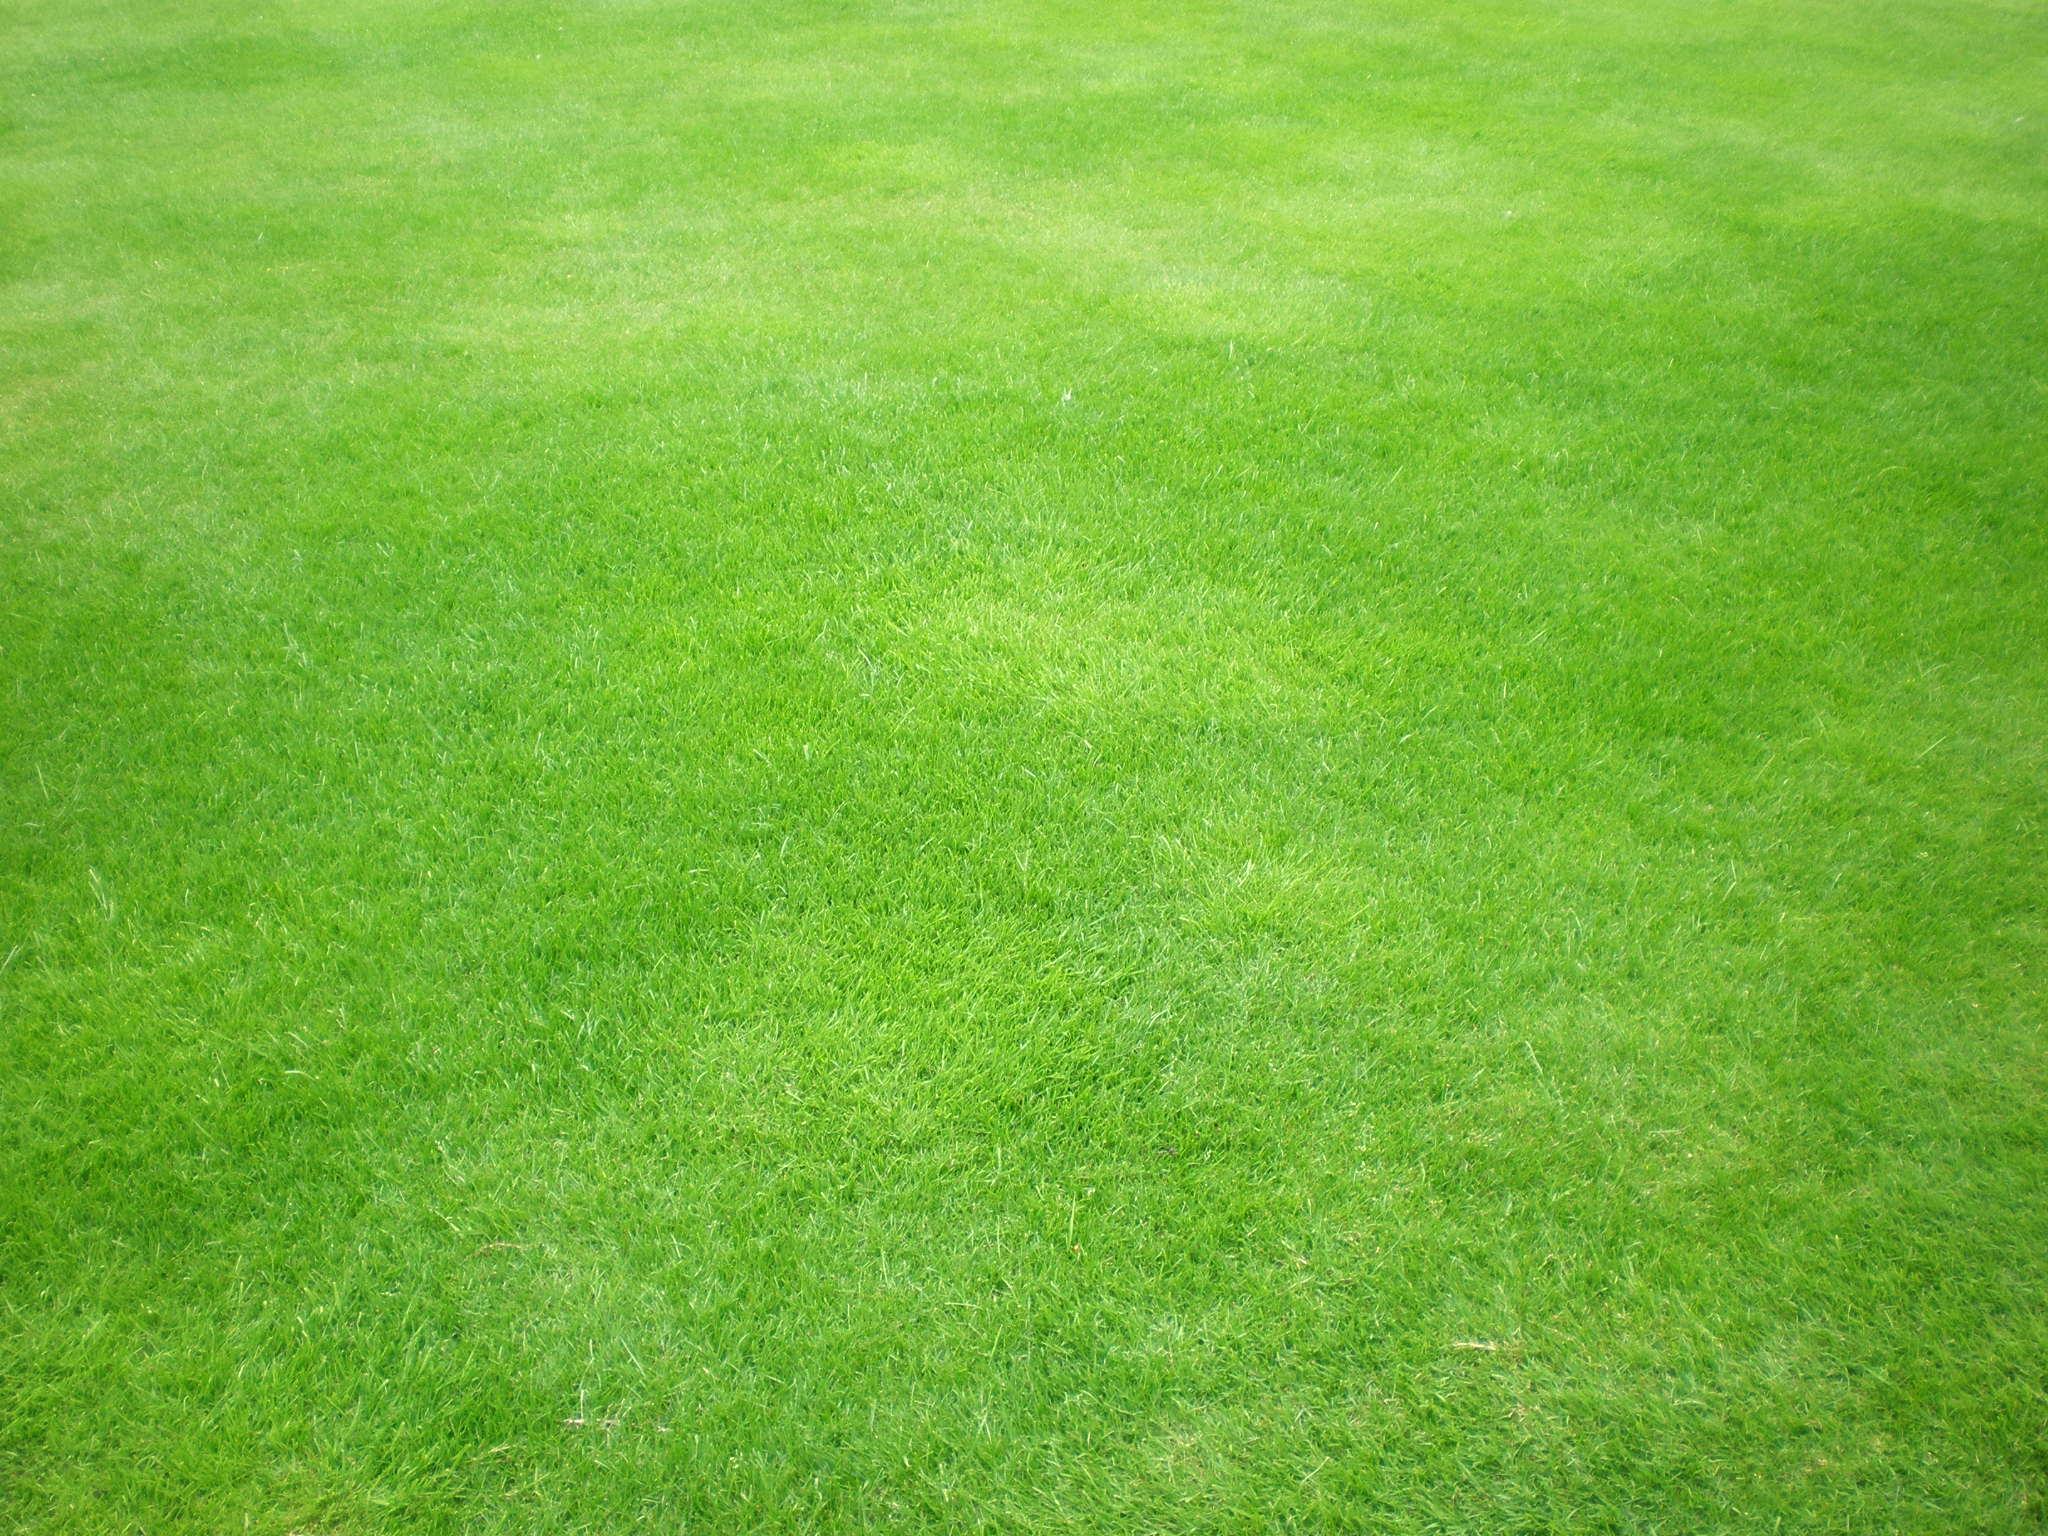 Textured wallpaper 2017 grasscloth wallpaper - Grass Texture By Jnetlakni Resources Stock Images Textures Other 2011